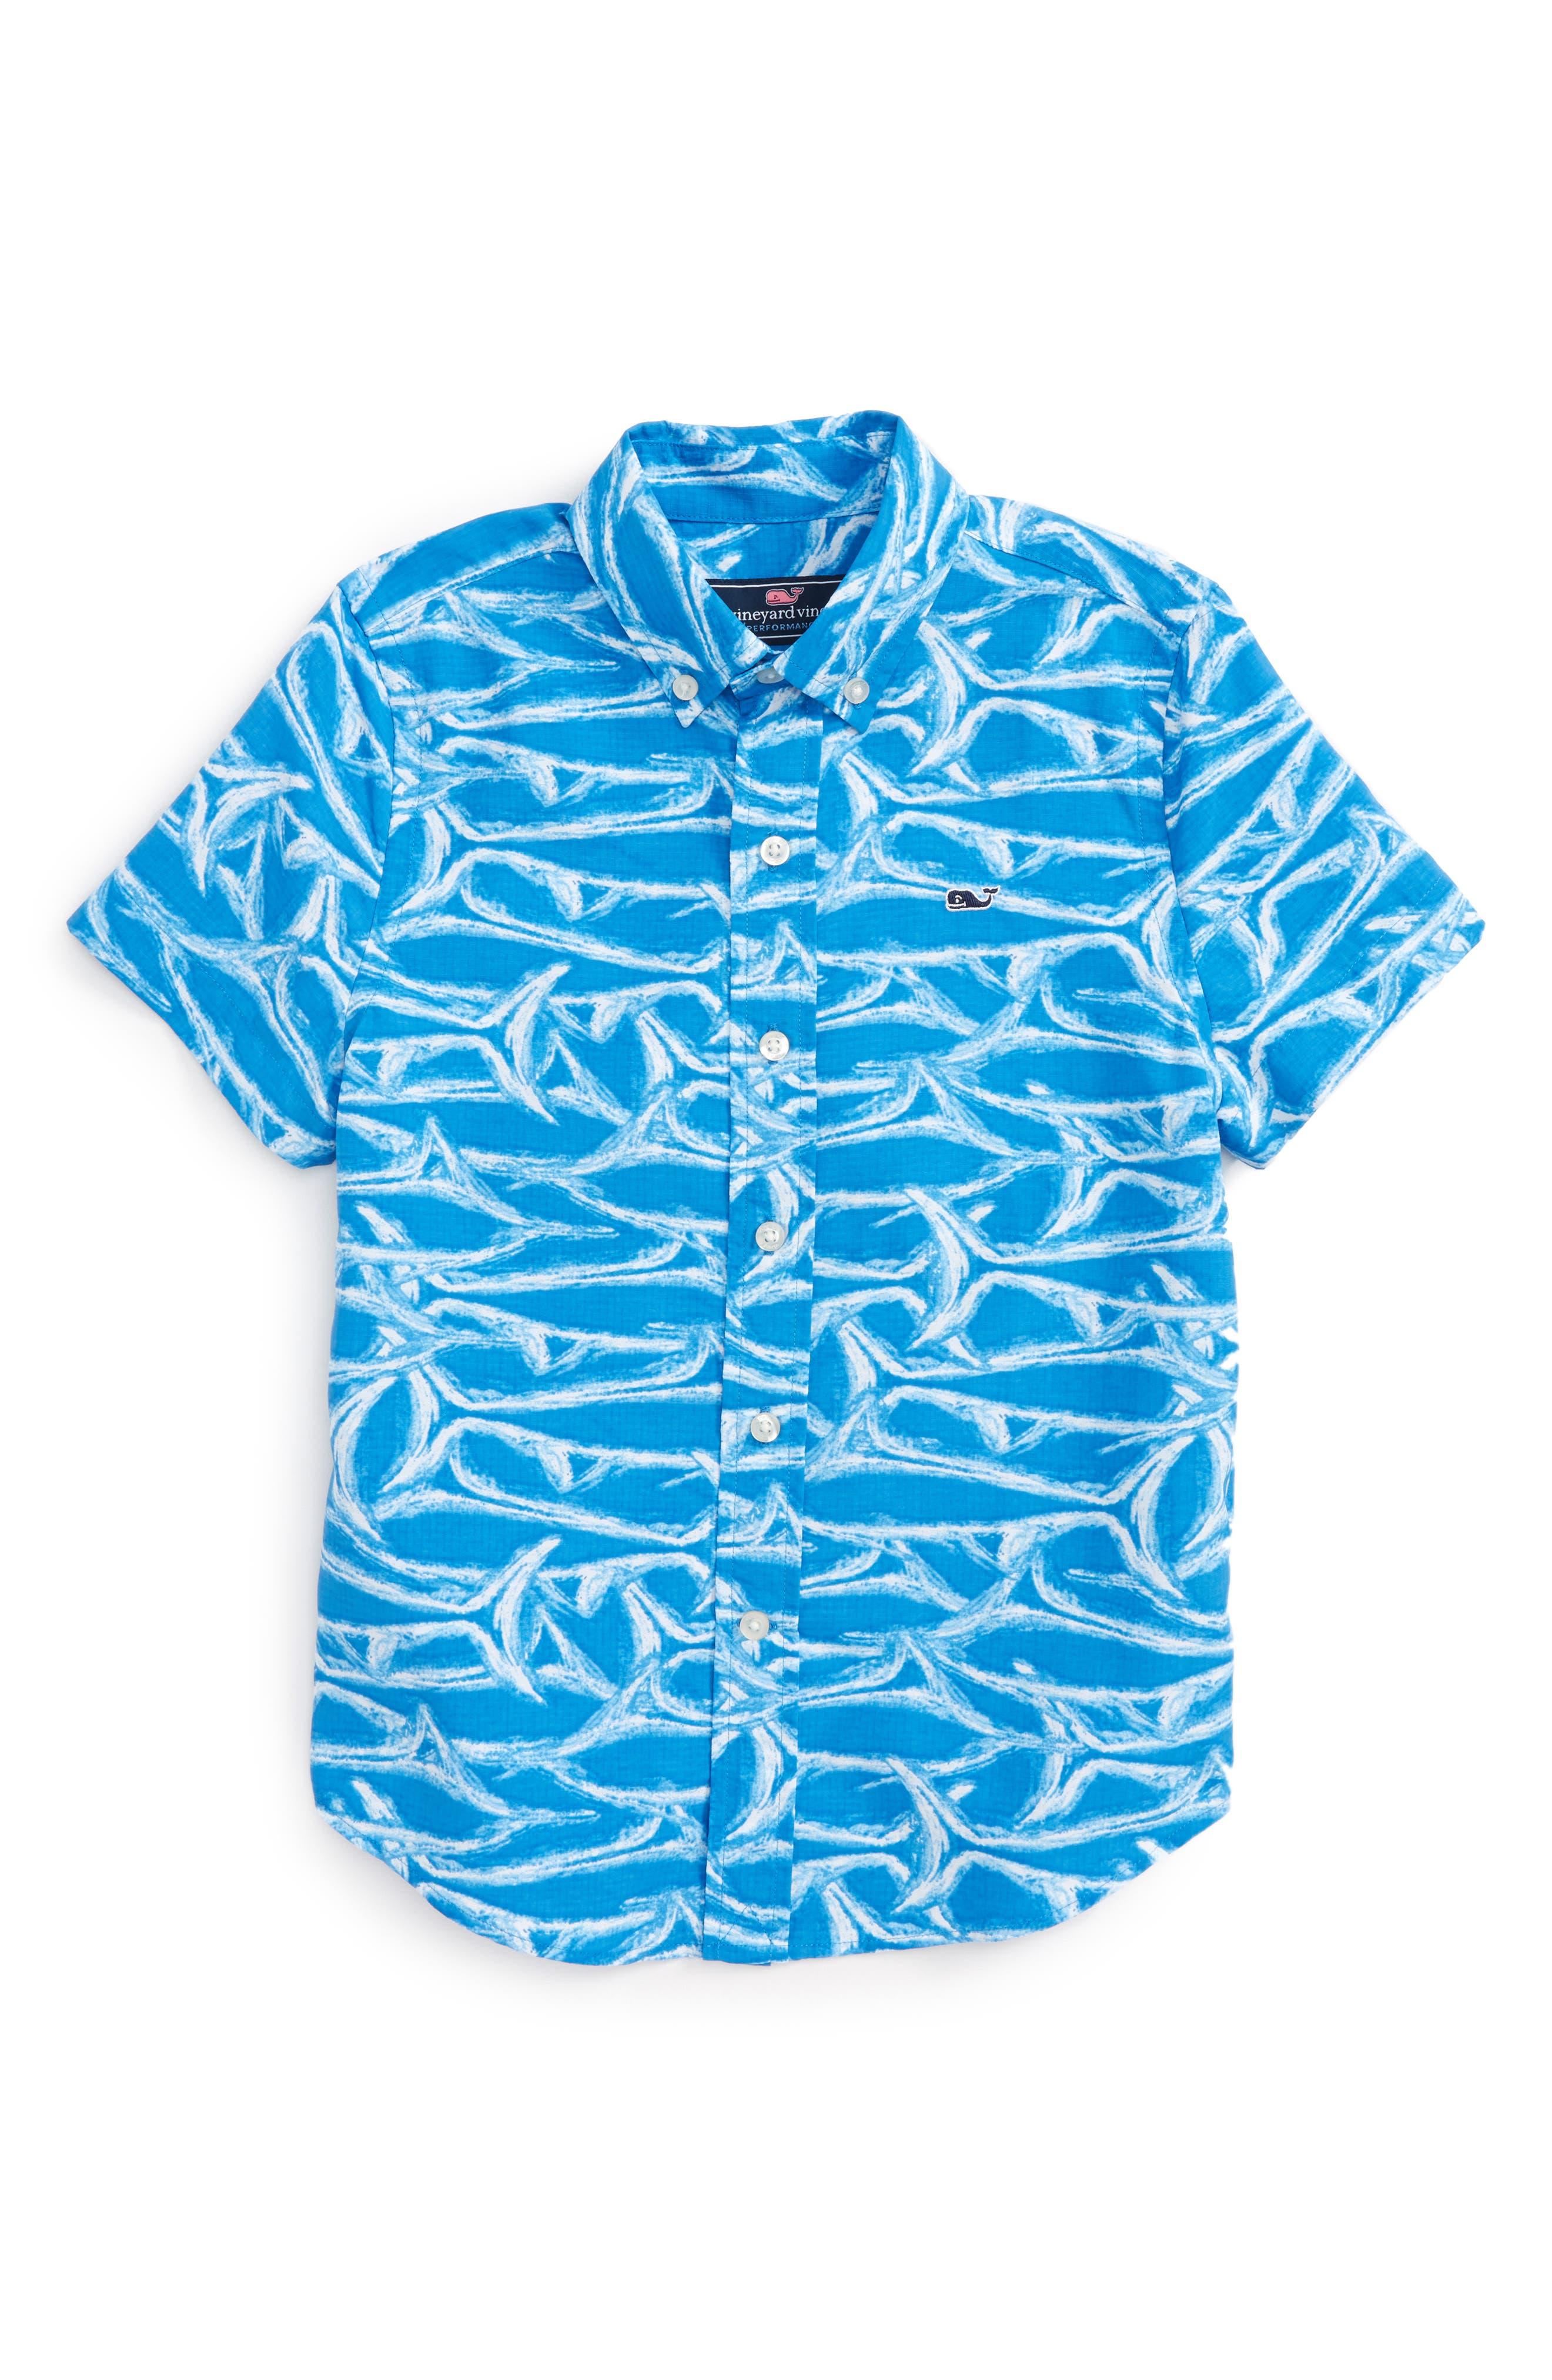 Vineyard Vines Brushed Marlin Whale Shirt (Toddler Boys, Little Boys & Big Boys)